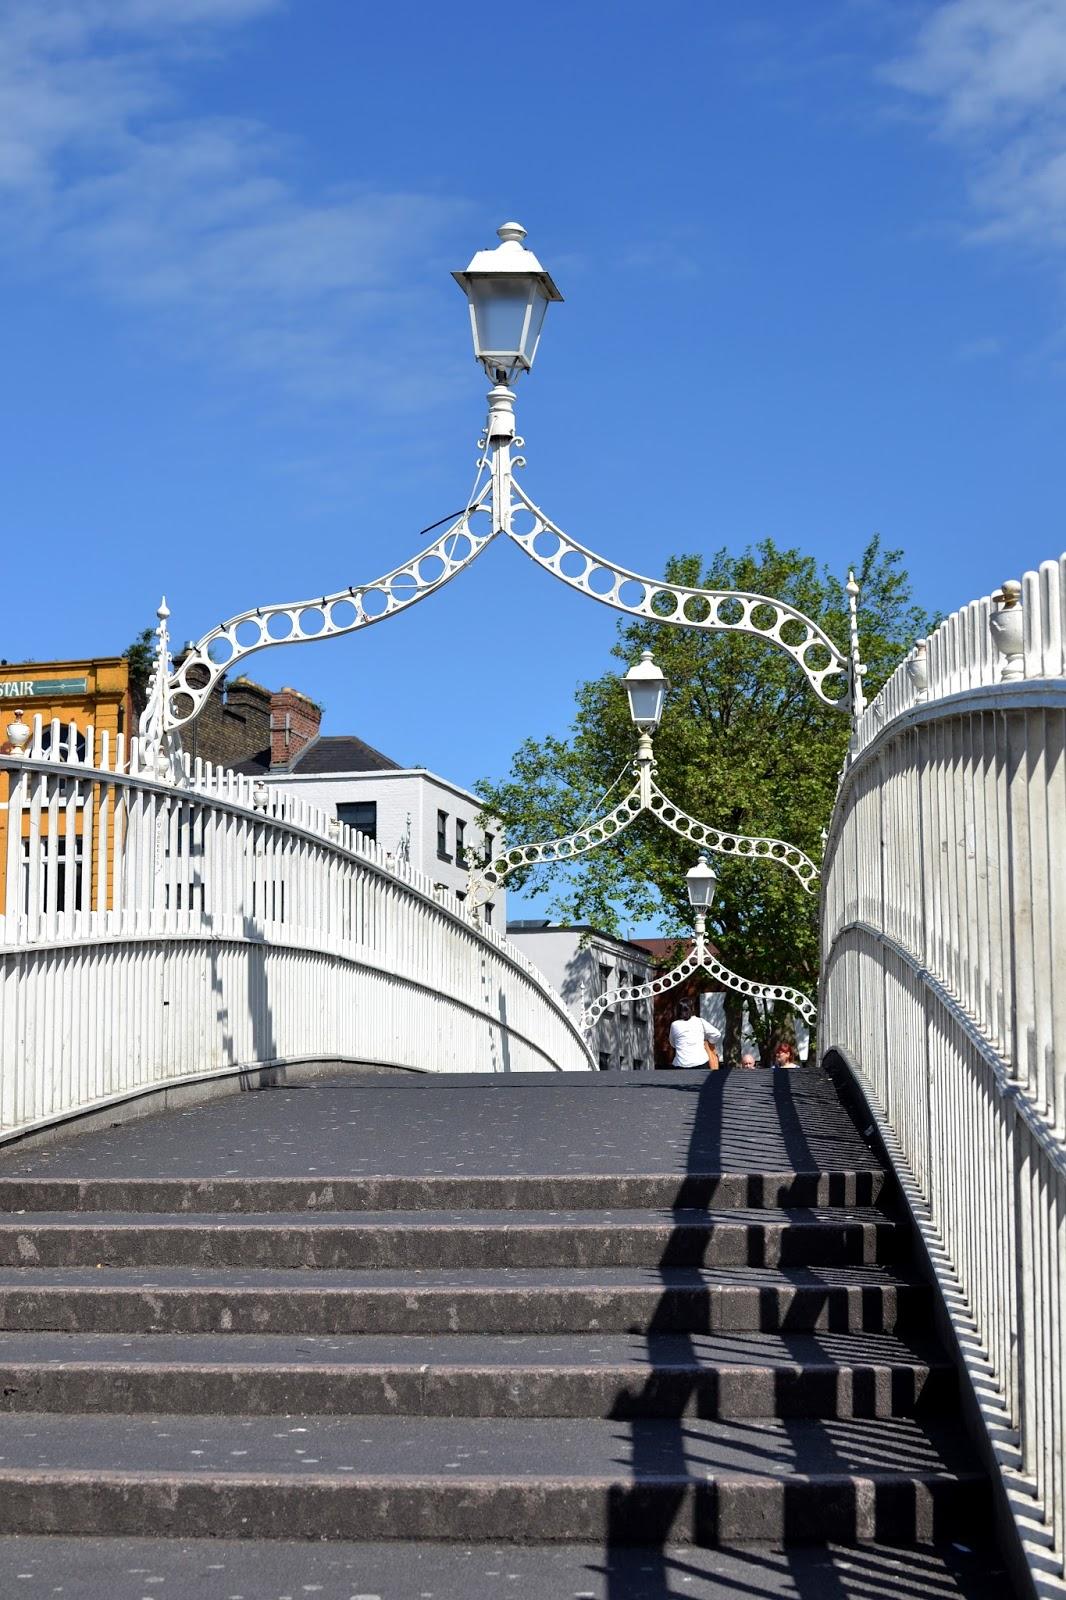 half penny bridge, ha'penny bridge, liffey bridge, wellington bridge, Dublin, Ireland, Europe, things to do in dublin, guide to dublin, travel blog, travelling, the custom house, liffey, ireland photography, dublin photography, eire, Guinness, temple bar, irish pub, traditional, cobbled street, beautiful, docks, dublin spire, O'Connell street, post office, LUAS, tram, Dublin Castle, half penny bridge, ha'penny bridge, liffey bridge, wellington bridge,